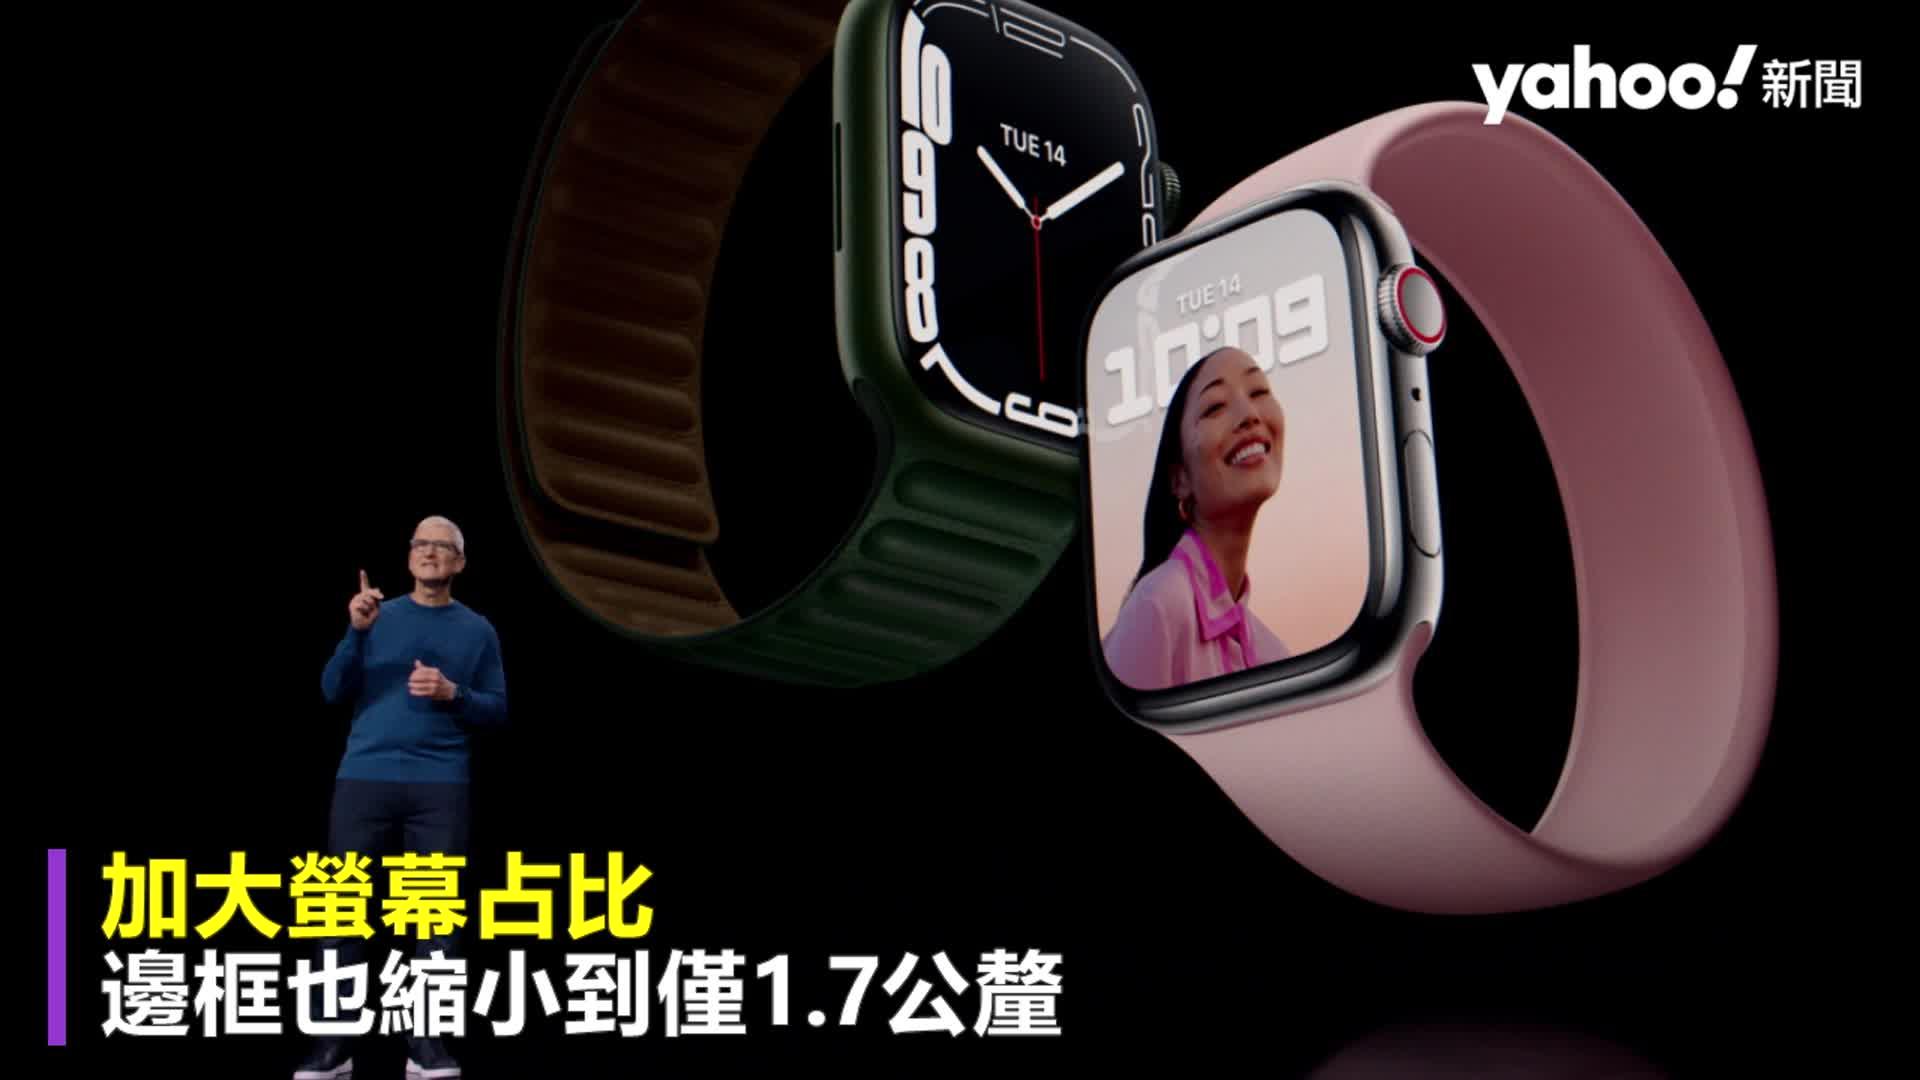 iPhone 13史上最貴容量最大 蘋果發表會亮點一次看